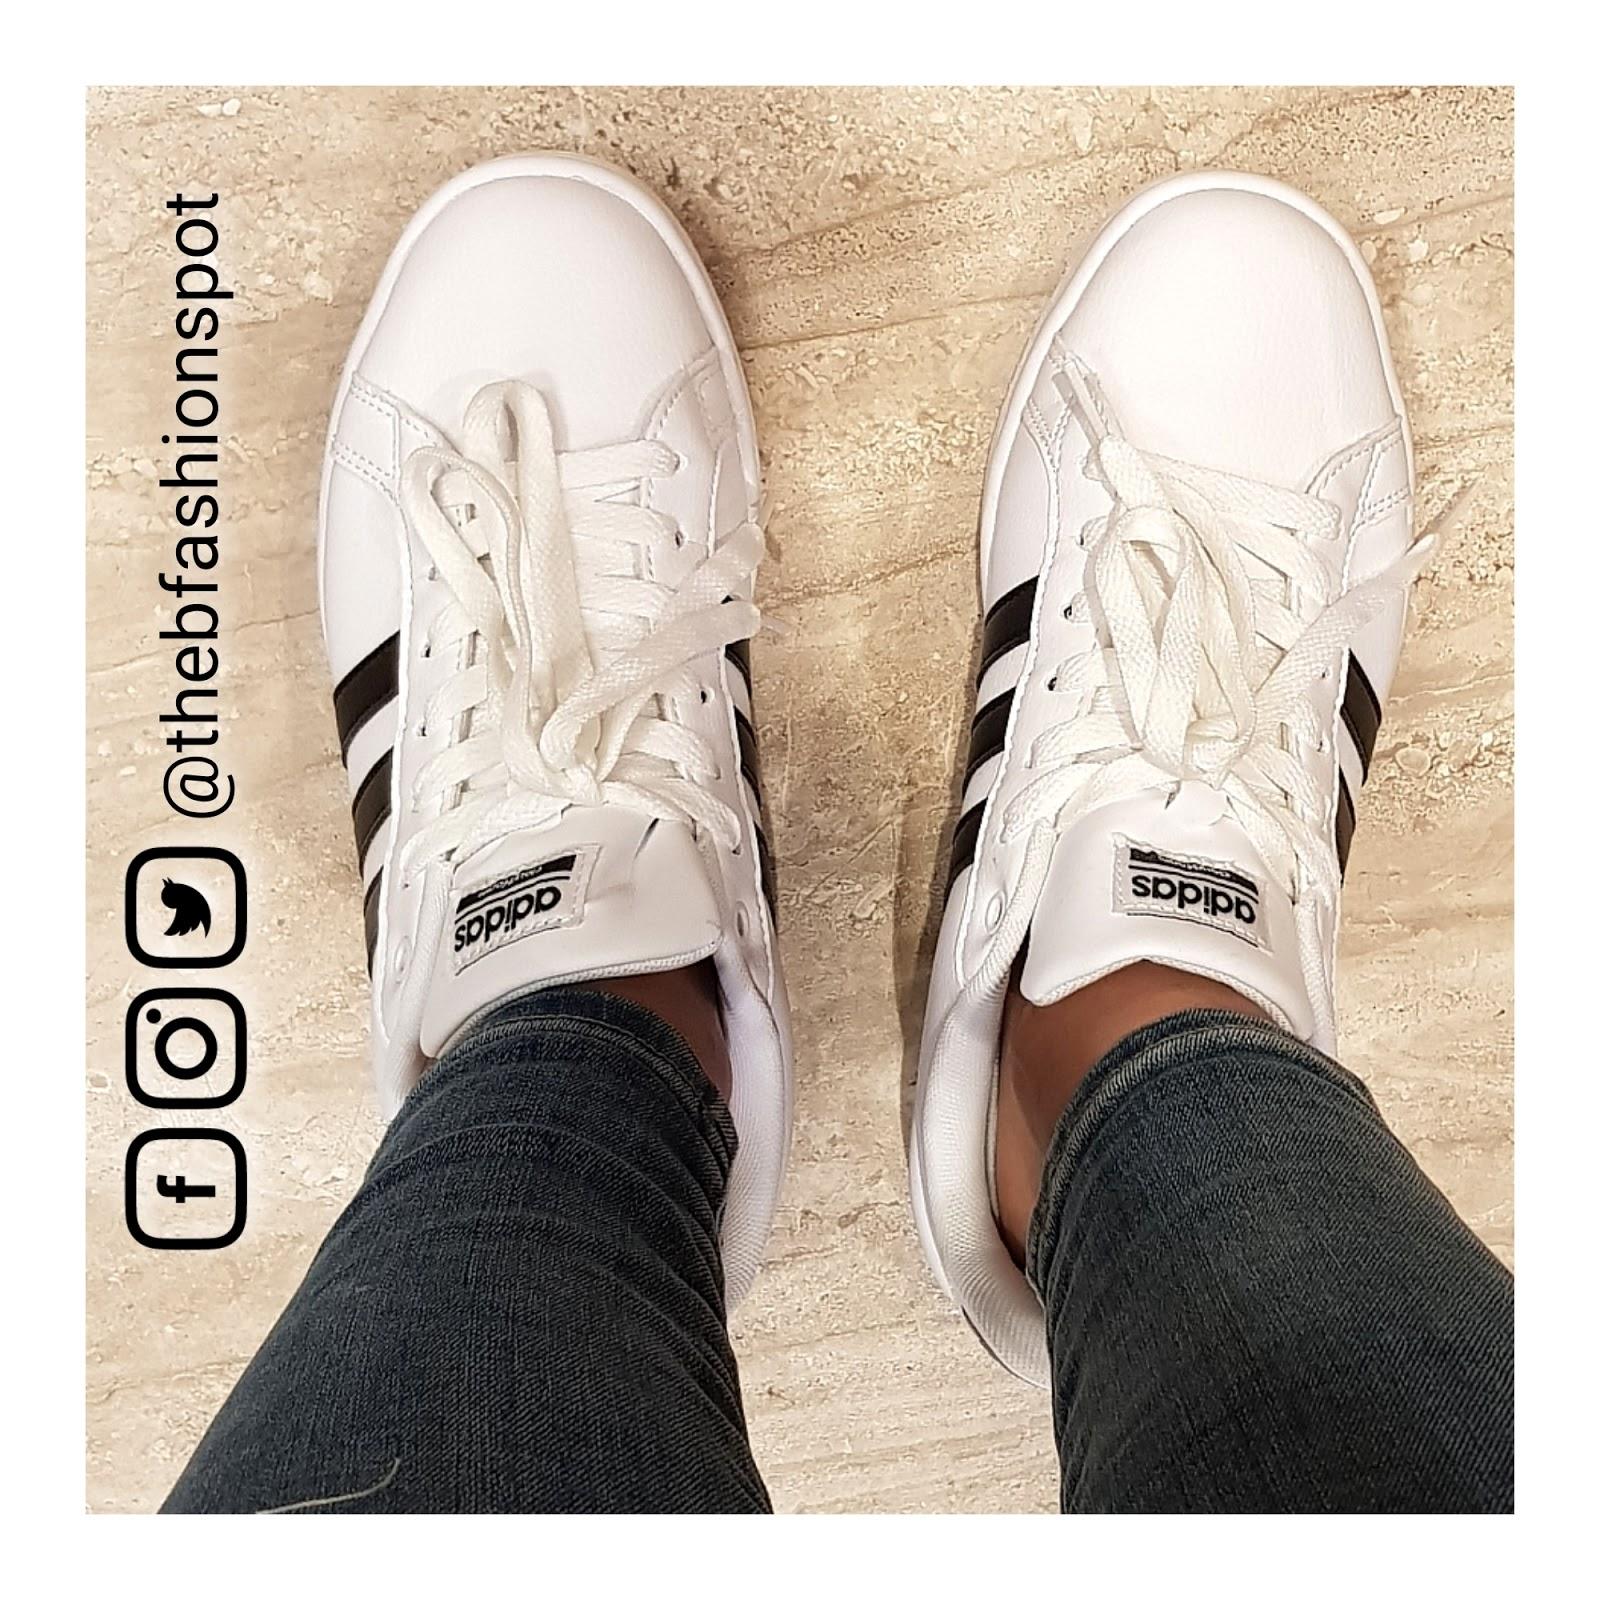 new style 63198 9a515 Tenis Adidas blancos y negros